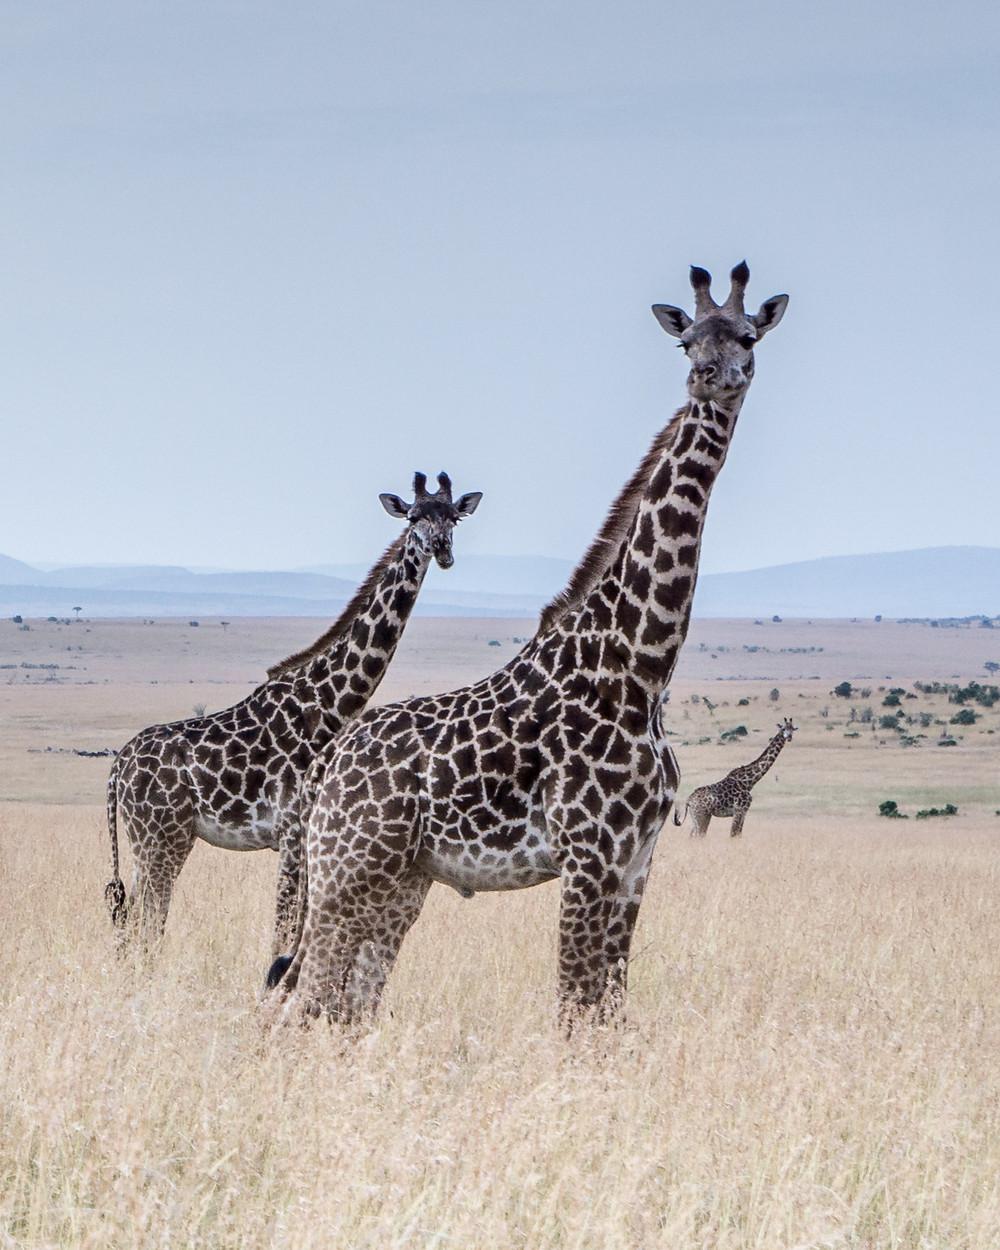 Giraffes in Kenya's Maasai Mara National Reserve